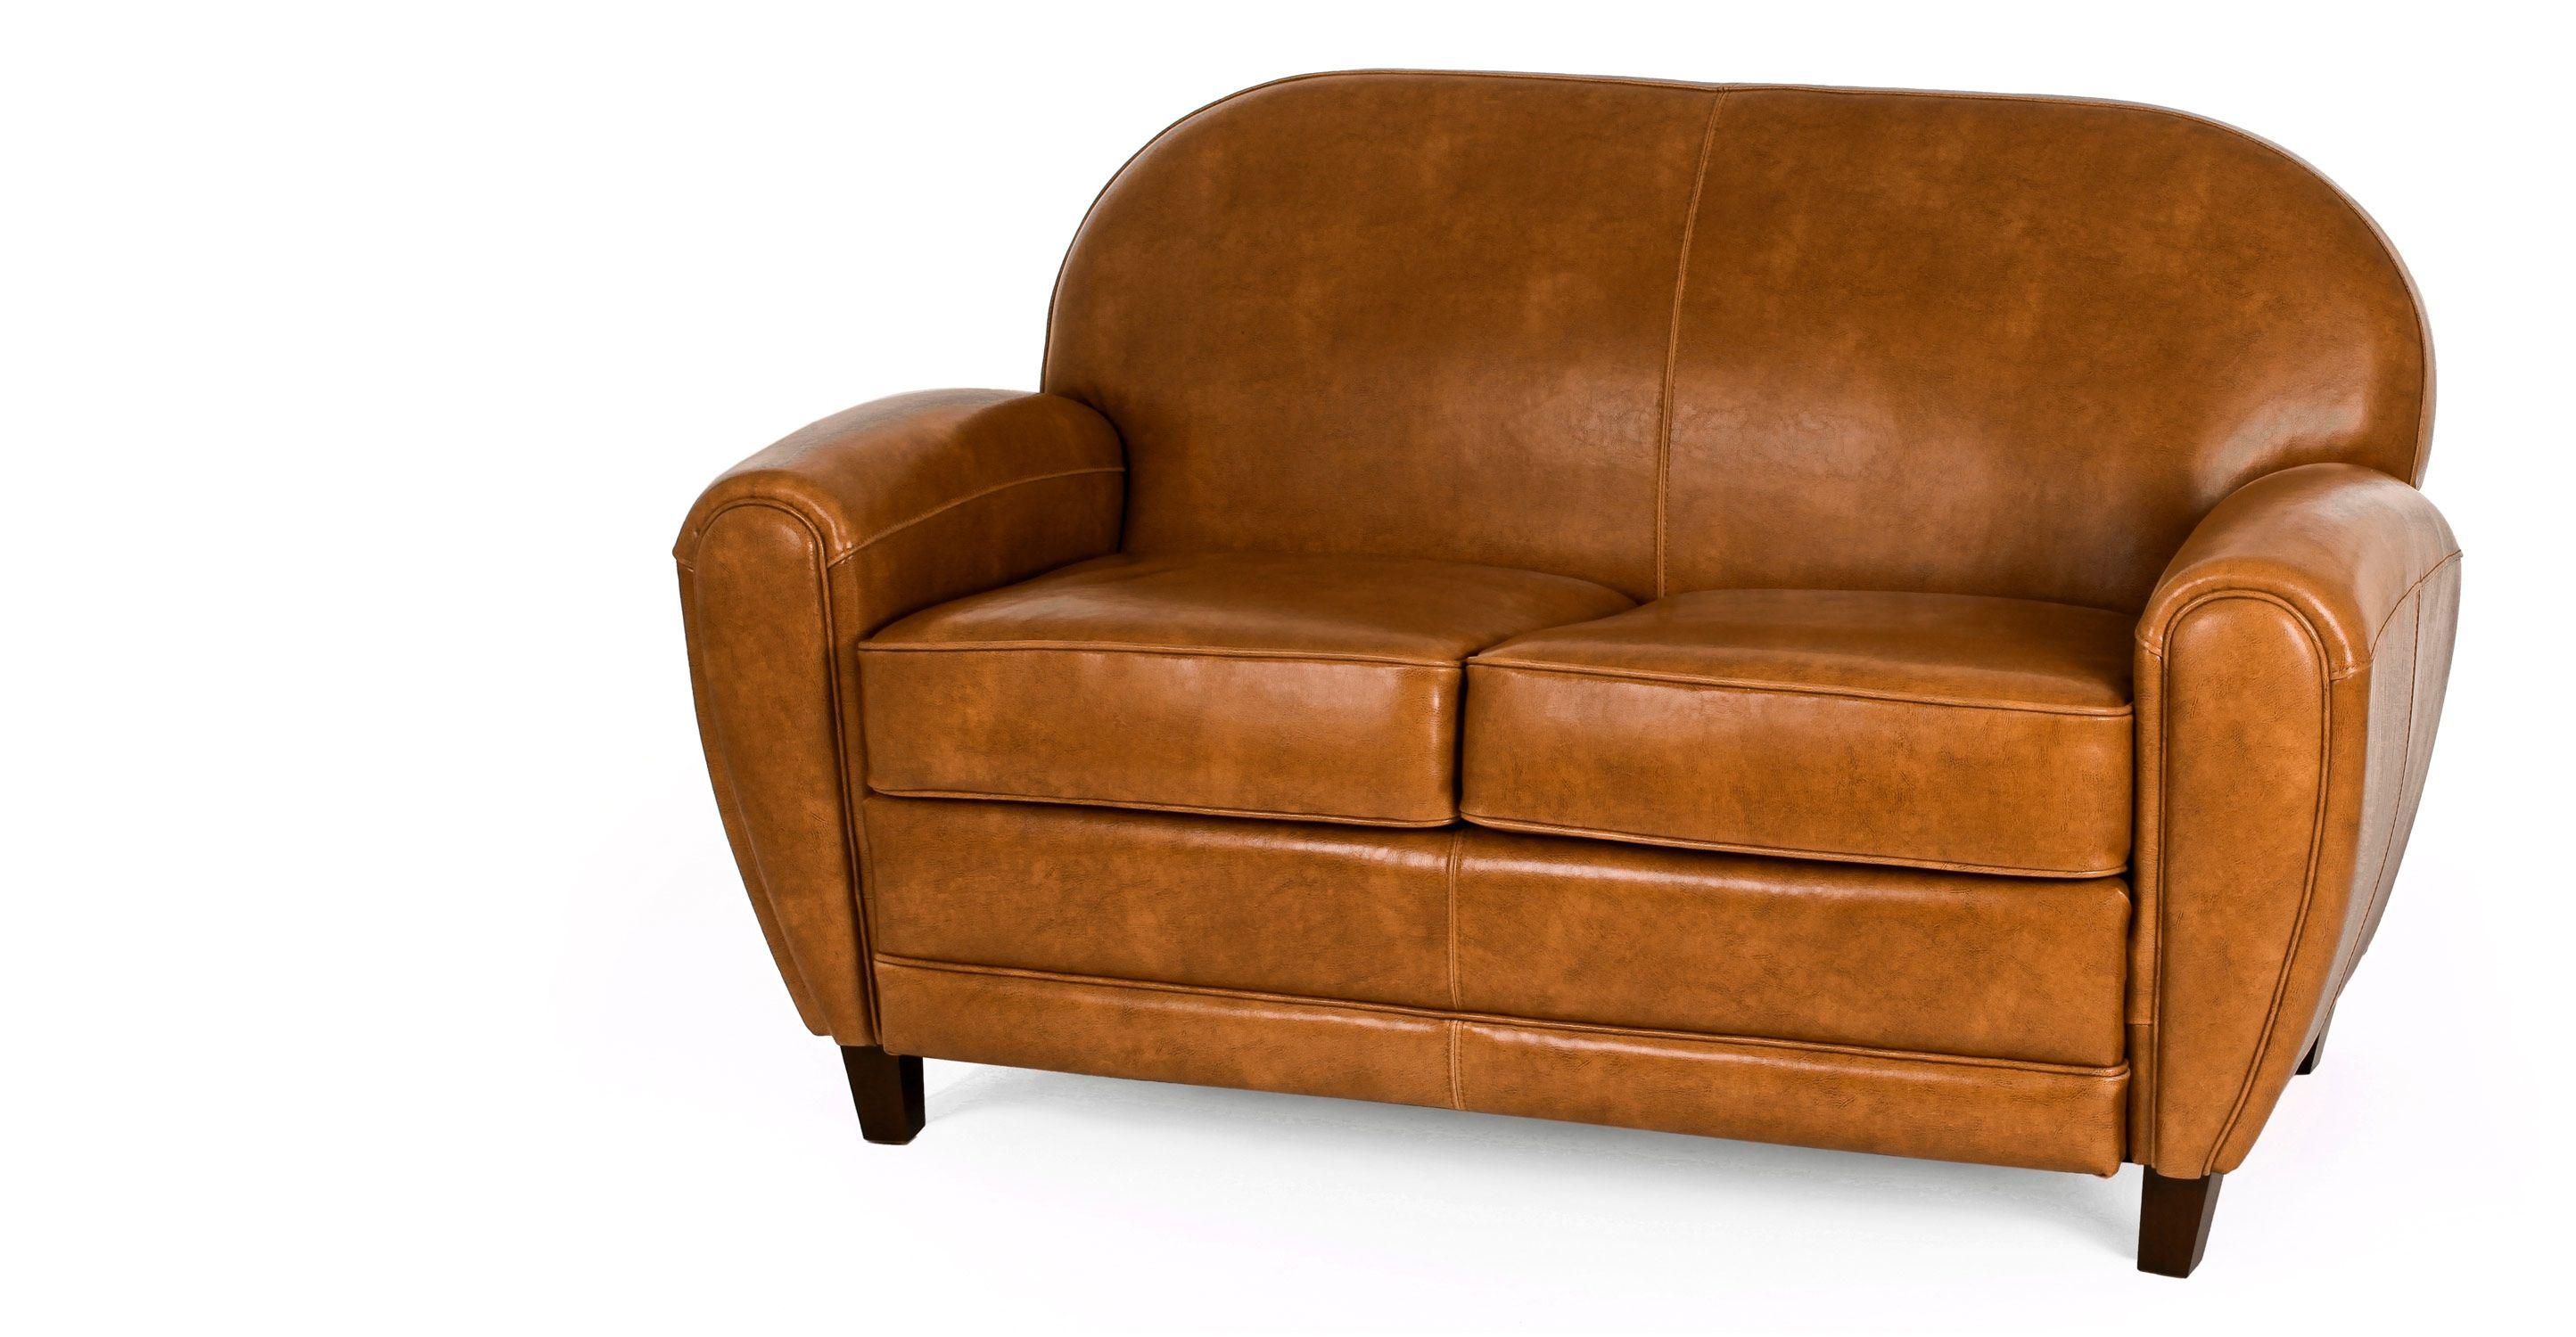 Jazz Club 2 Seater Sofa, Cognac